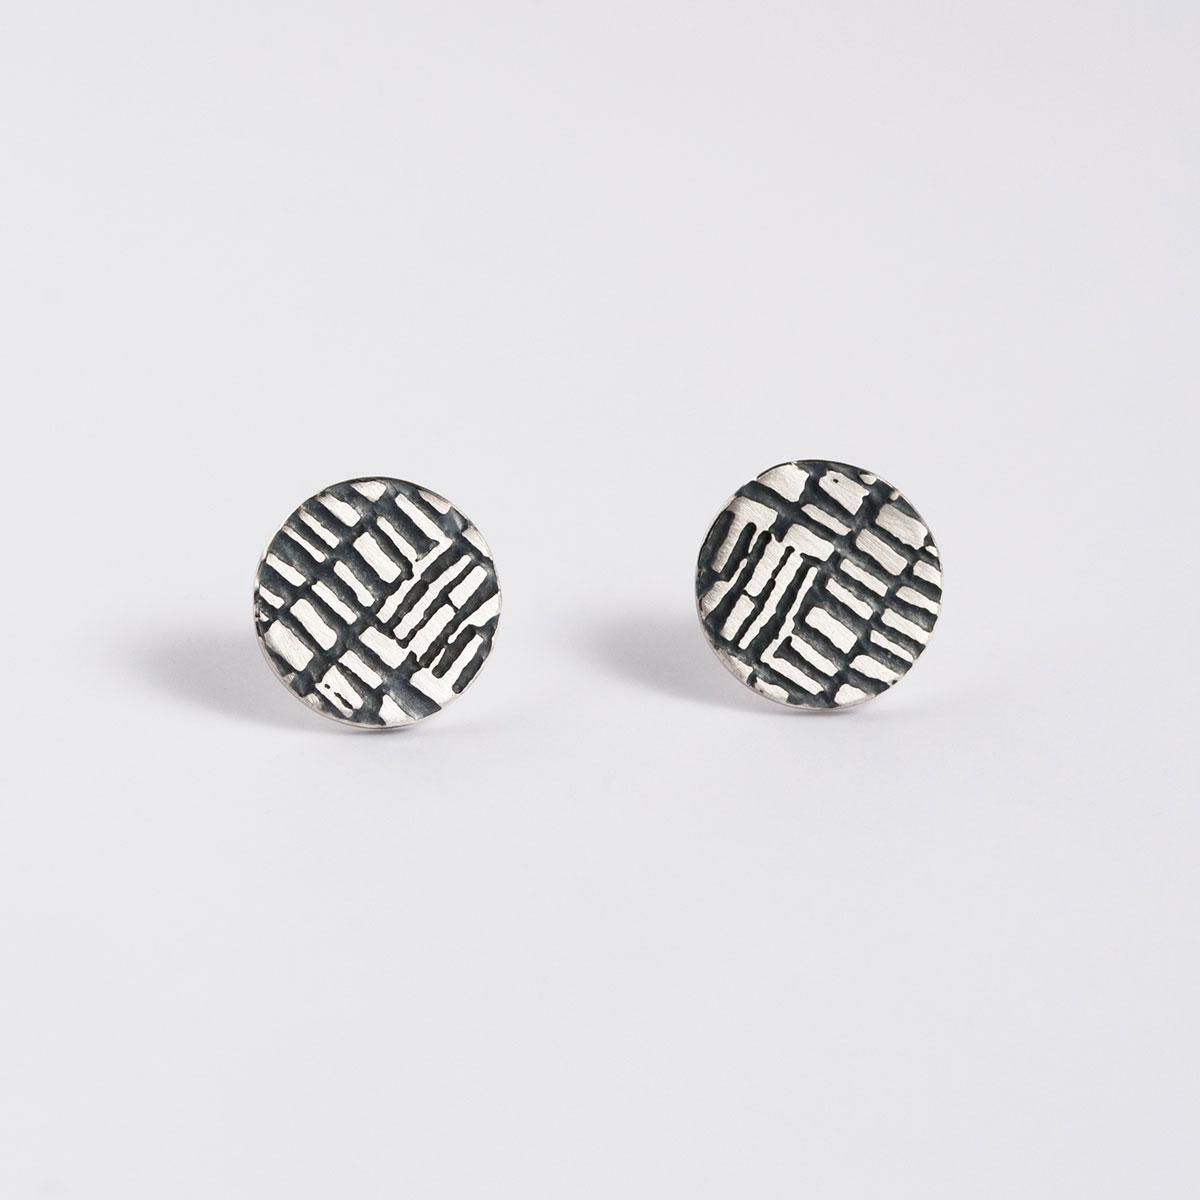 'Weave' Silver and Black Dot Stud Earrings, Medium